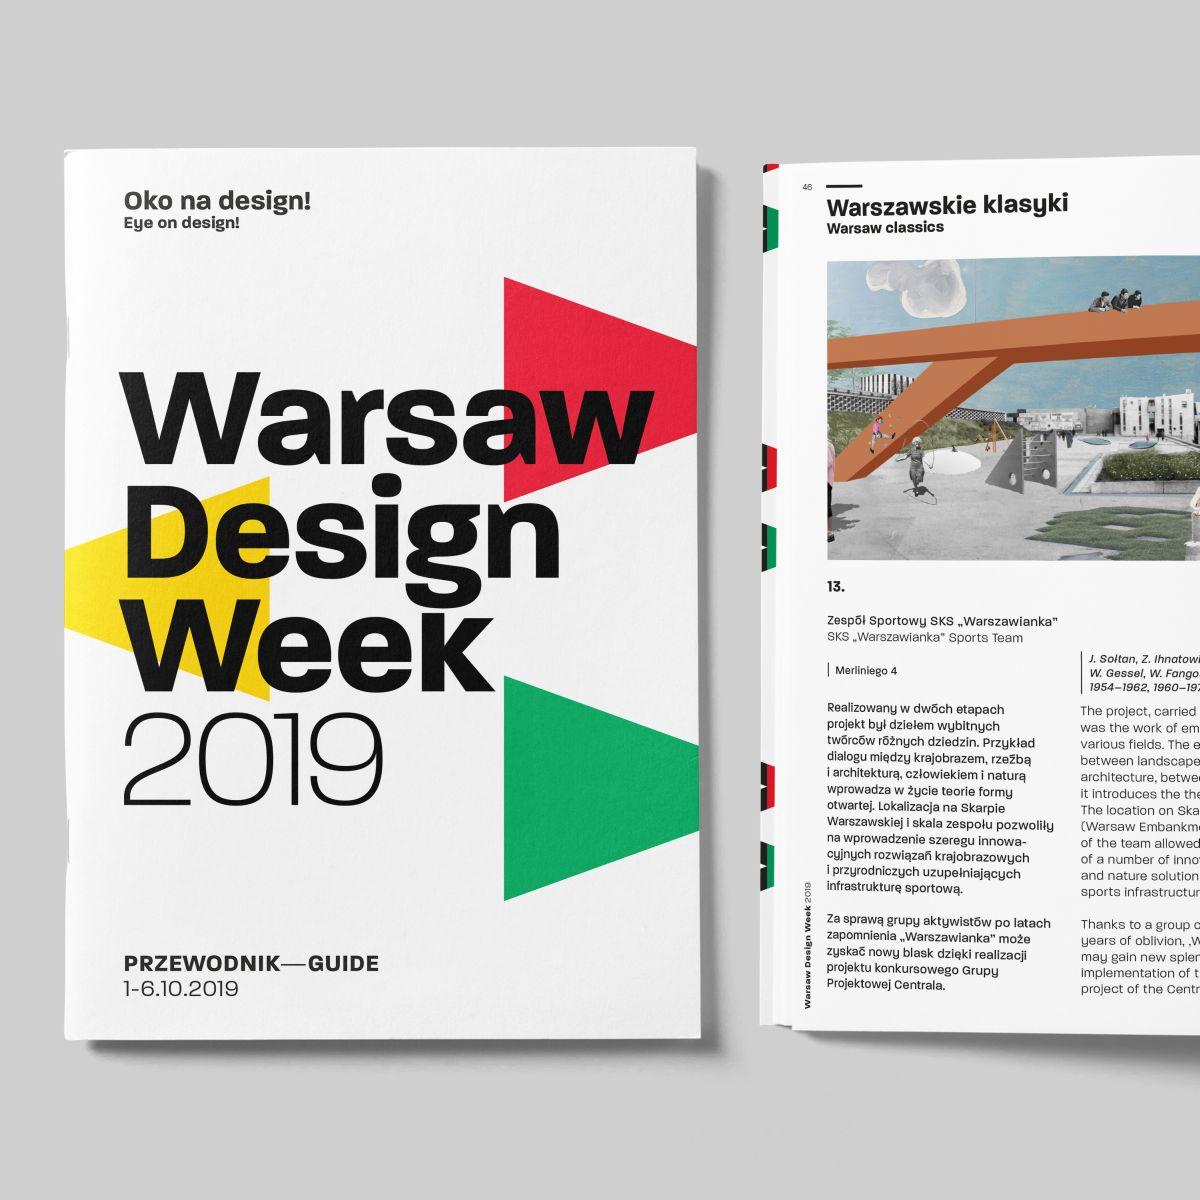 warsaw_design_week_press_release_foto_small